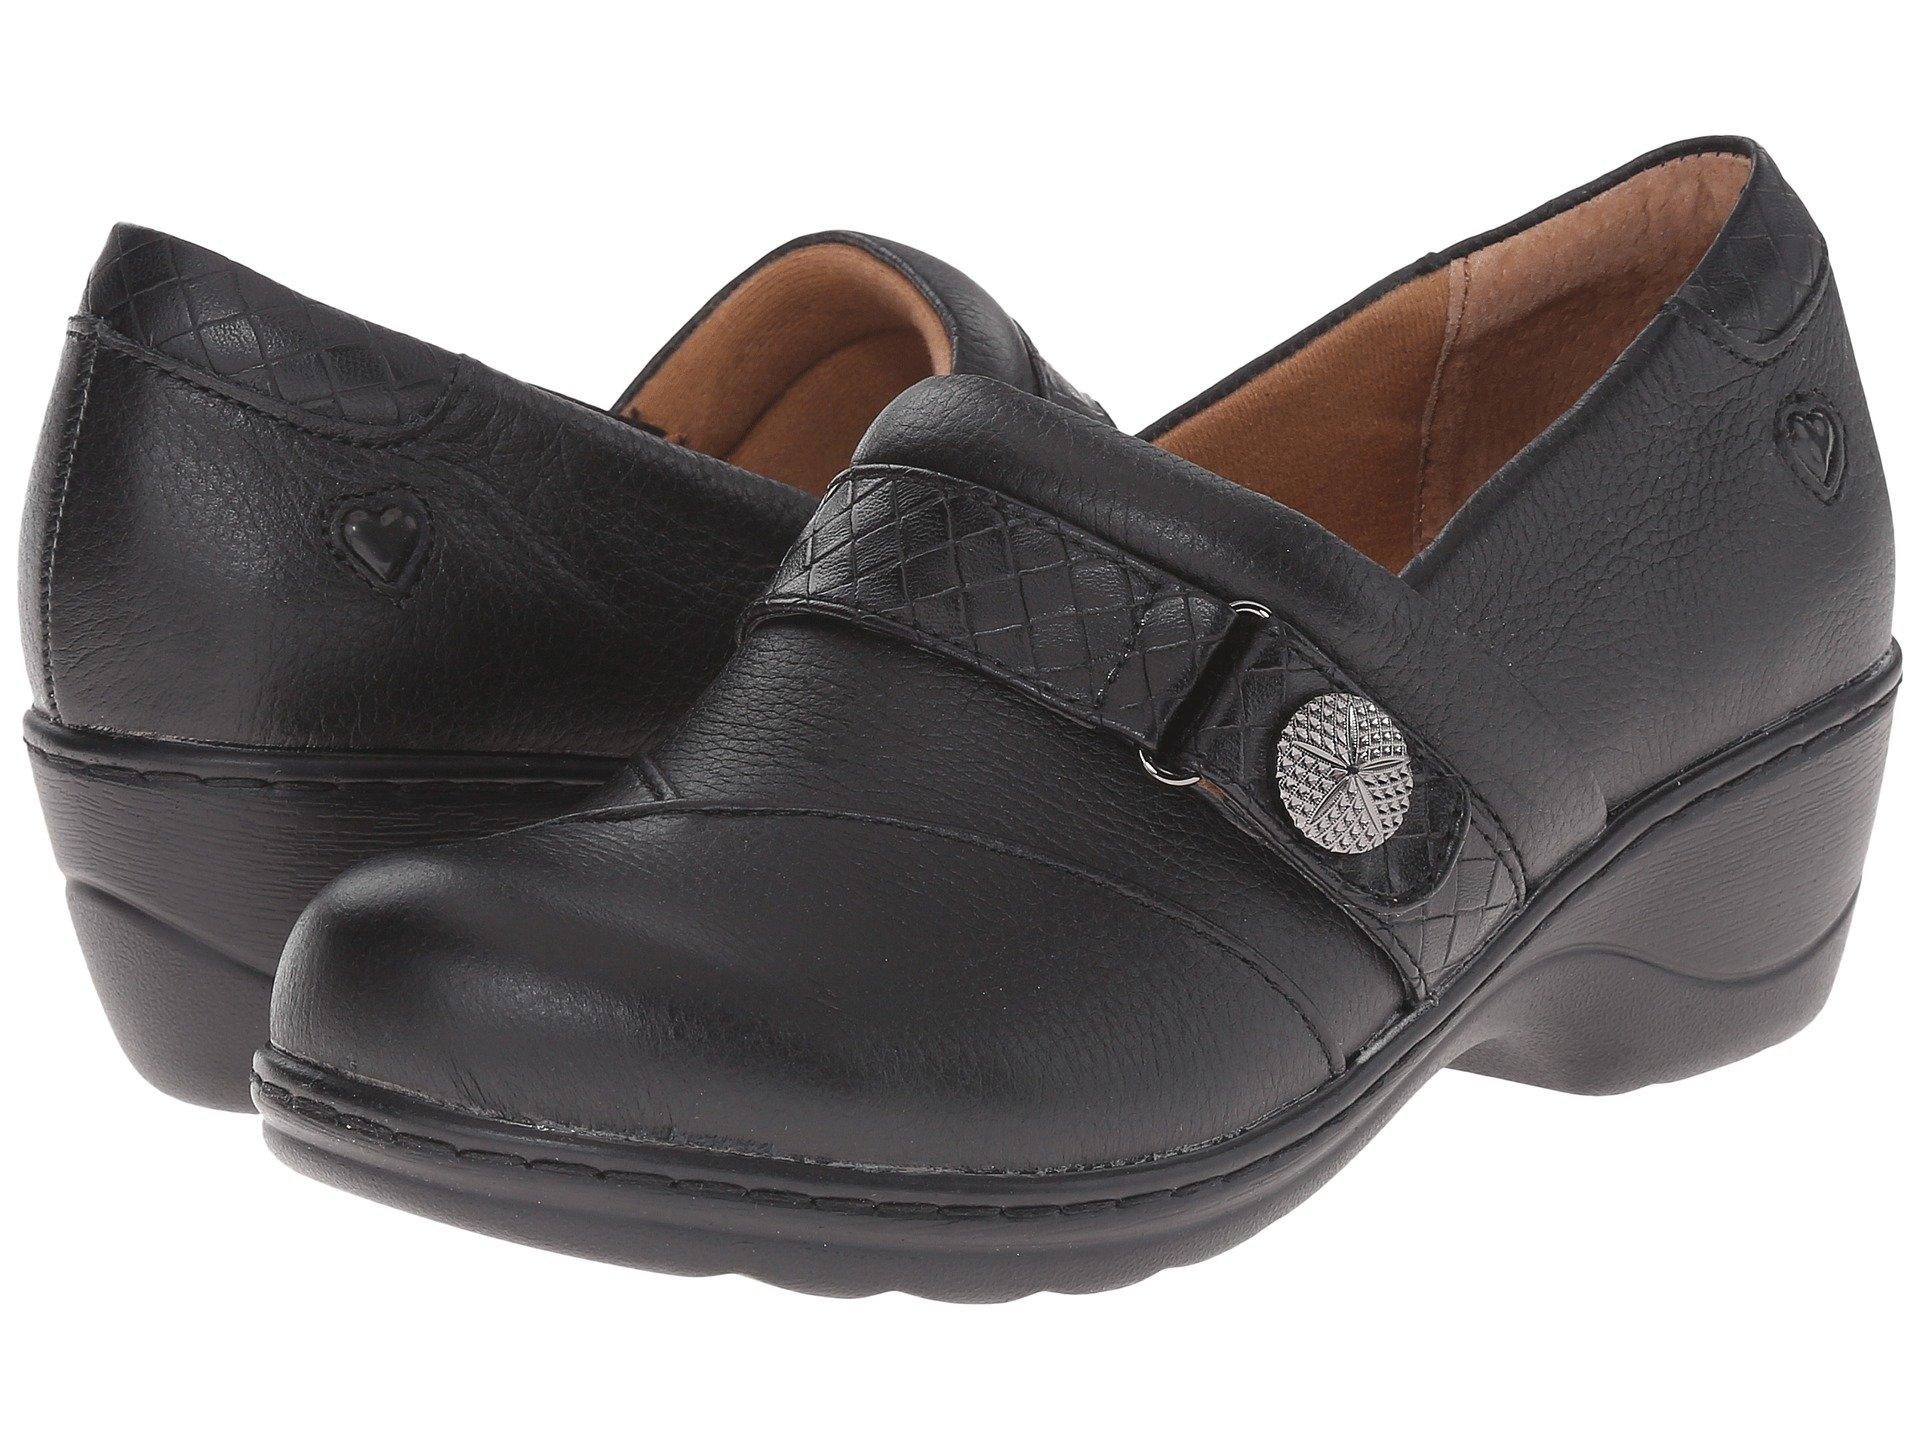 soft skechers boots s toe round work comfortable winter prevnext comforter mens shoes black p shoe stride leather c men galley